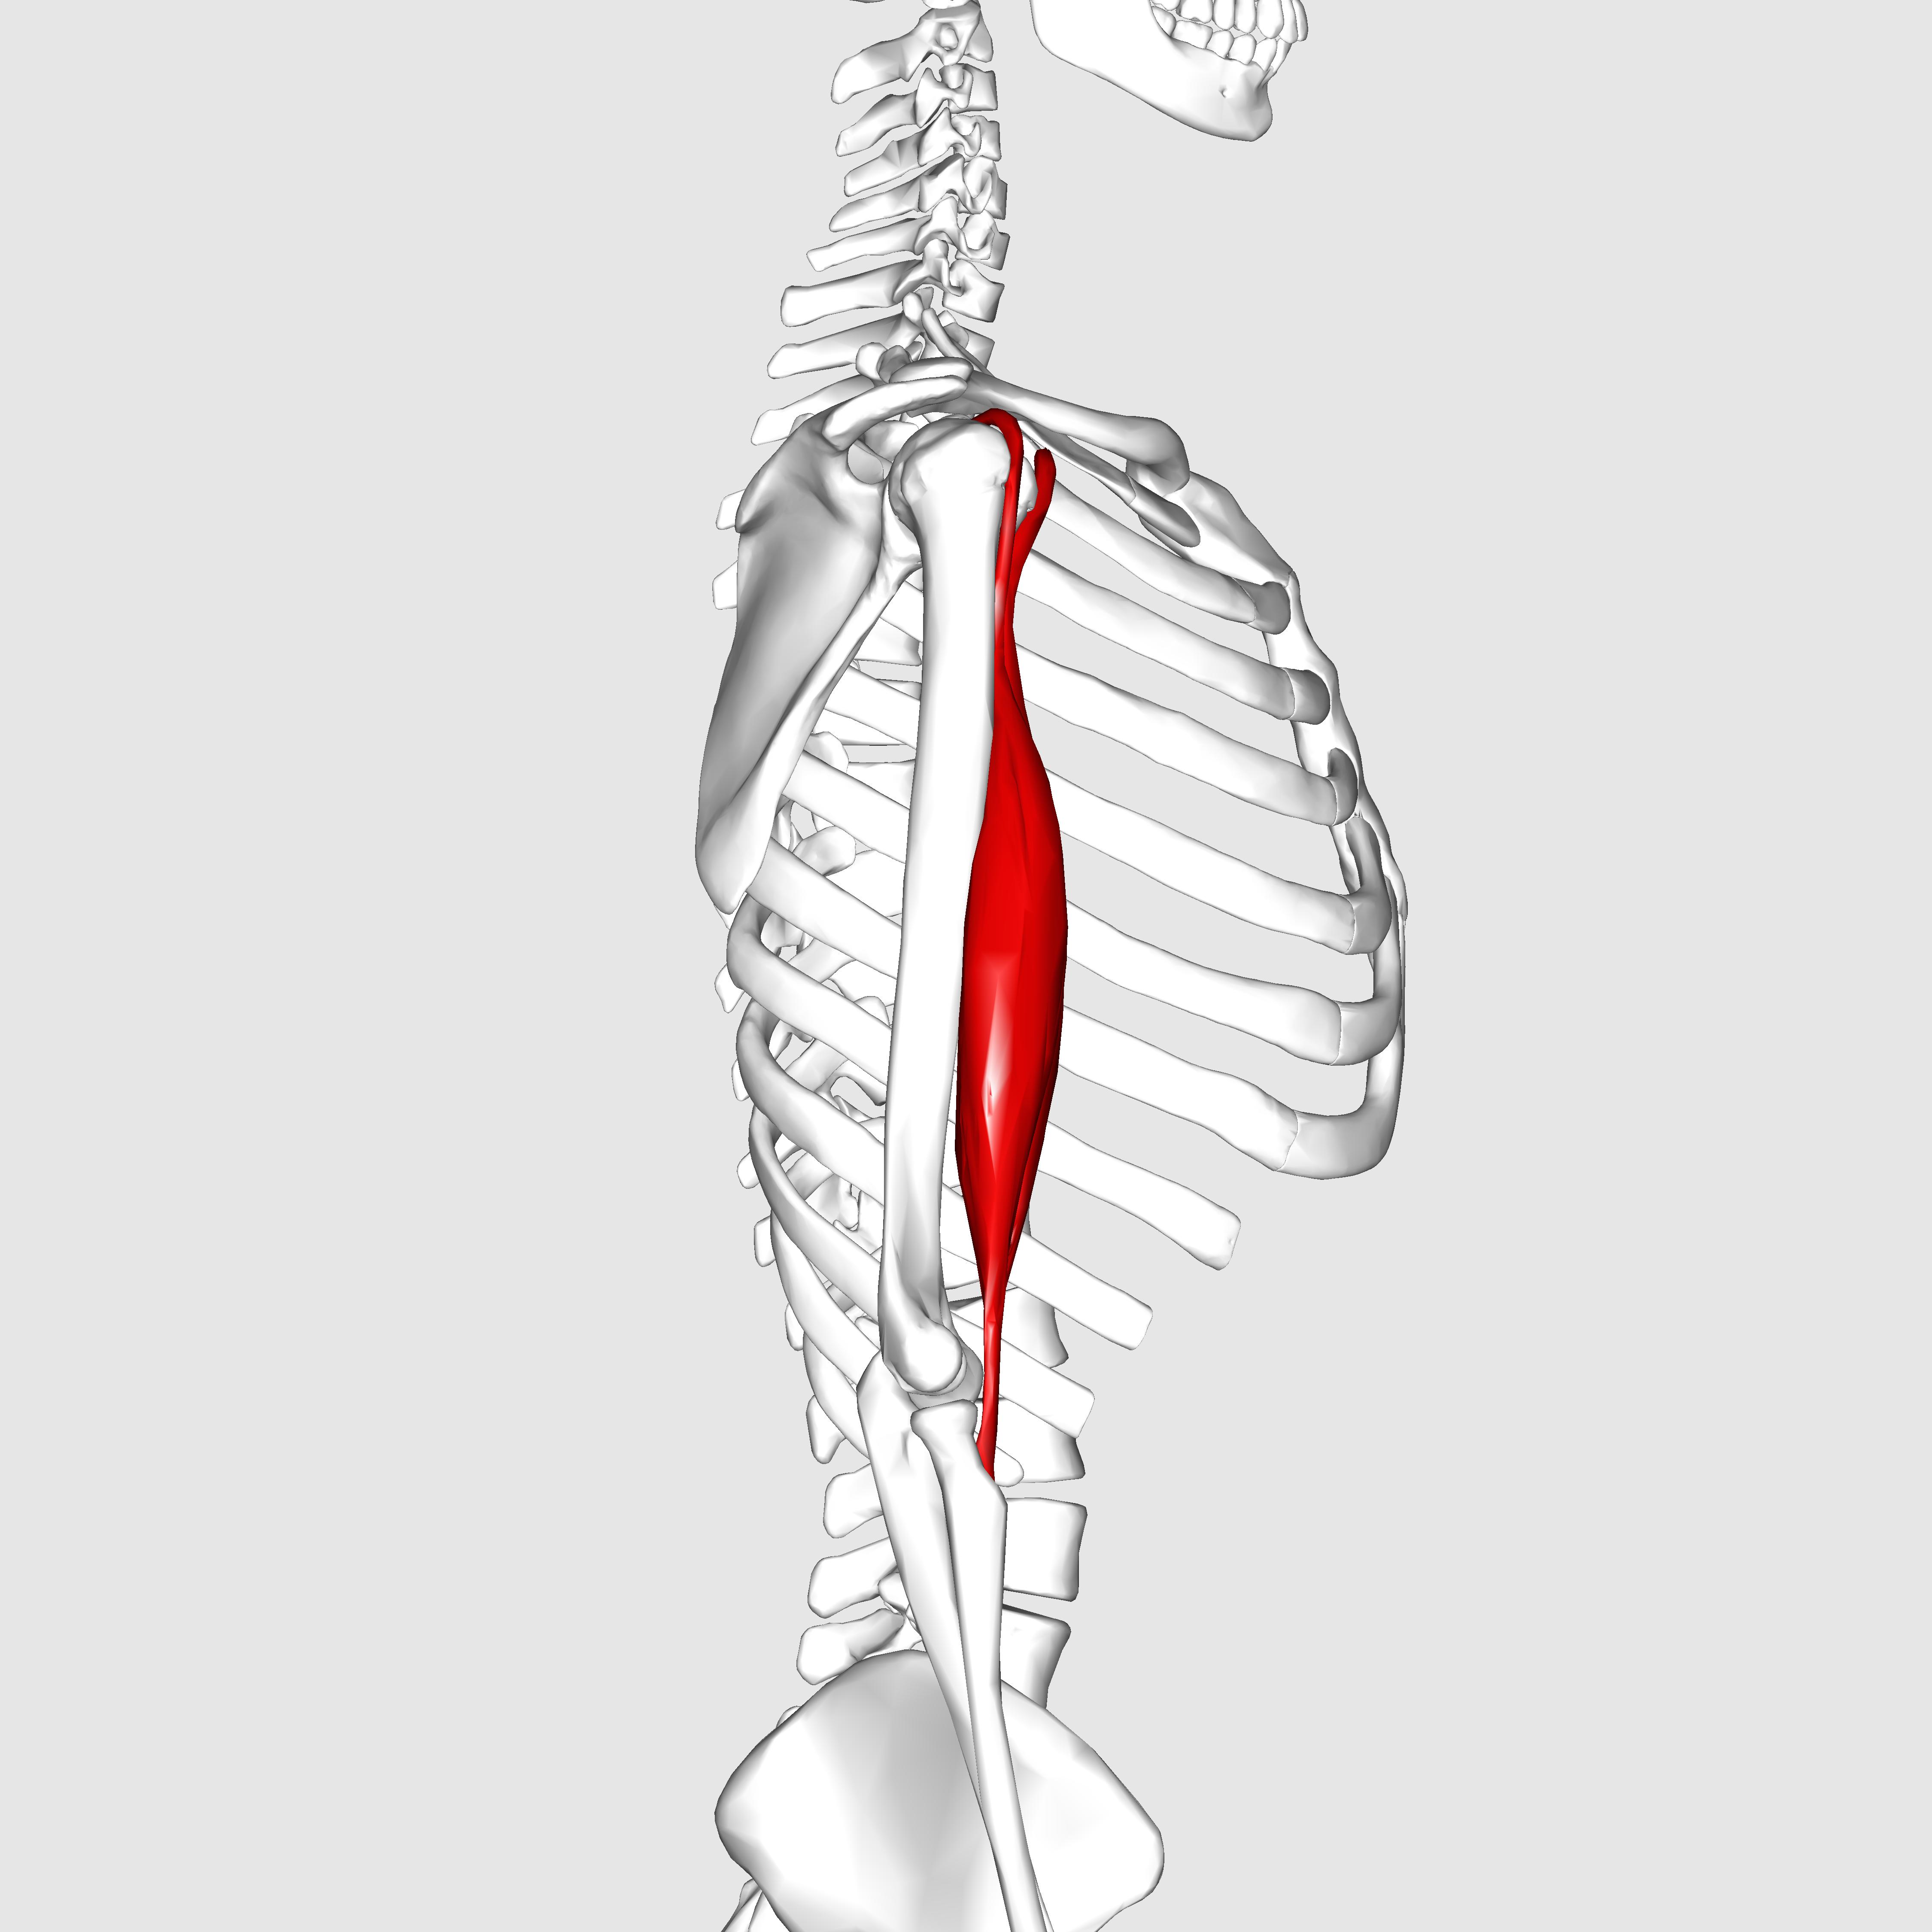 biceps brachii muscle - photo #16